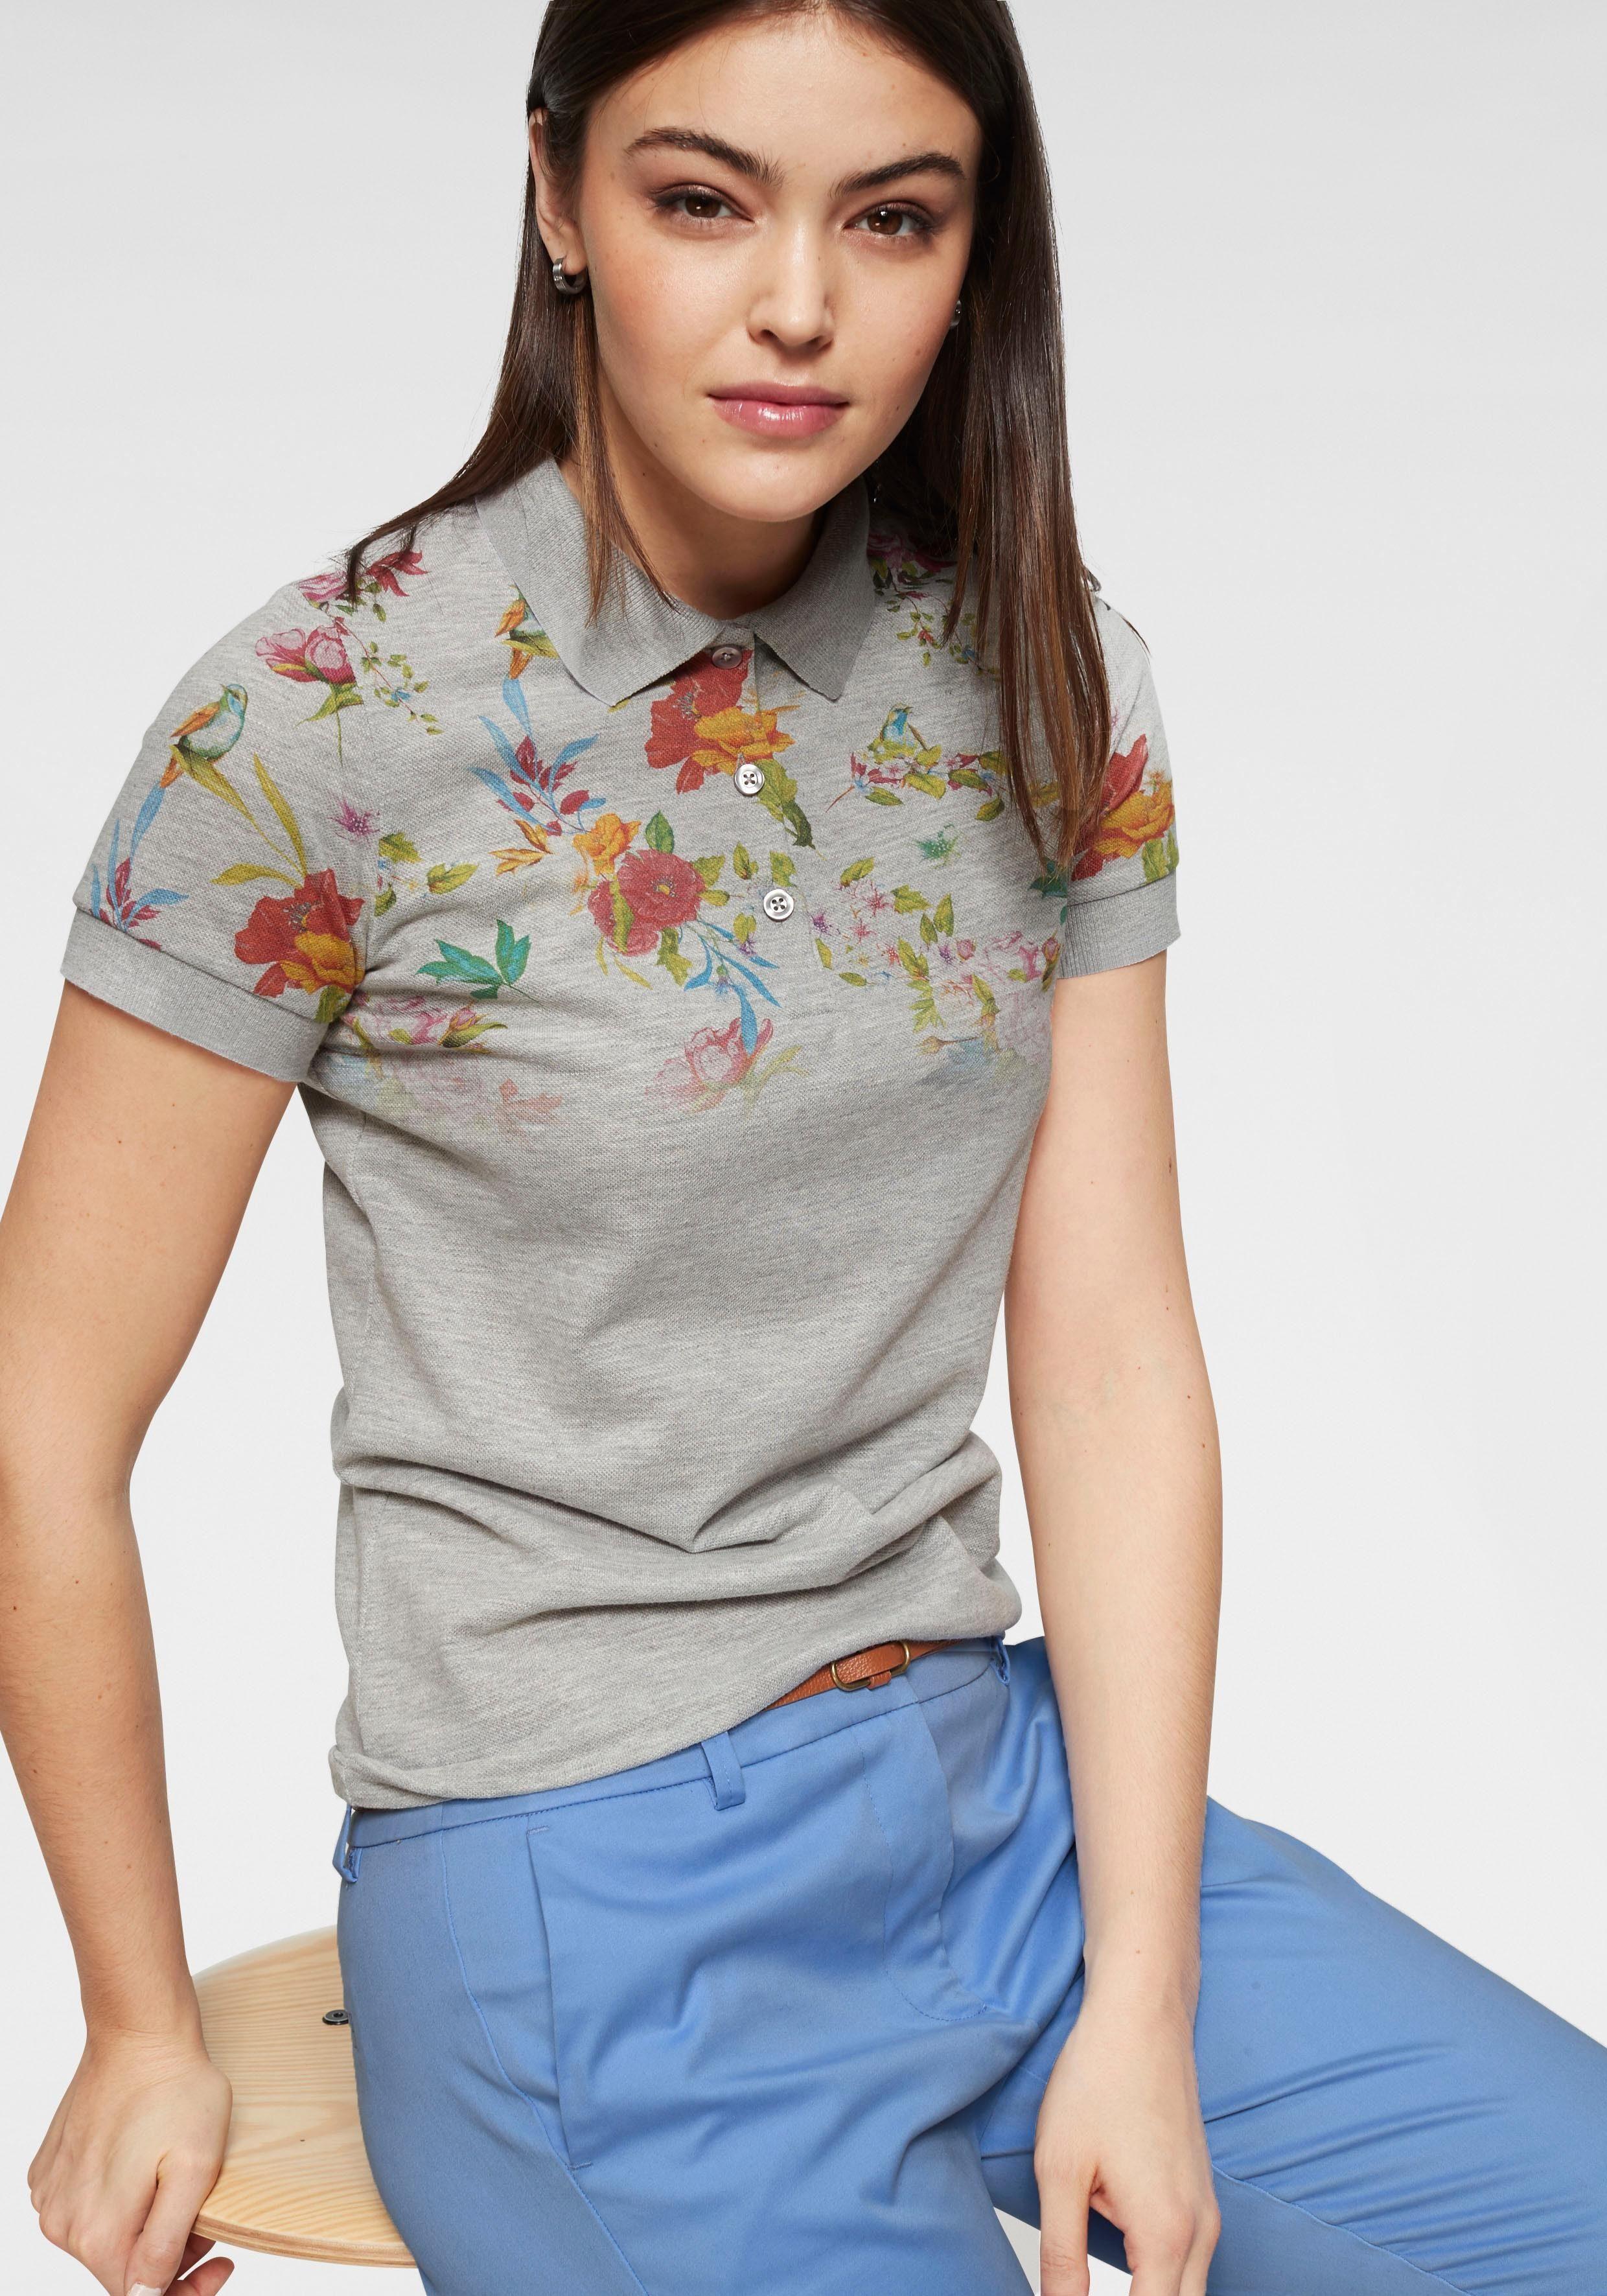 IN LINEA Poloshirt mit femininem Blumendruck